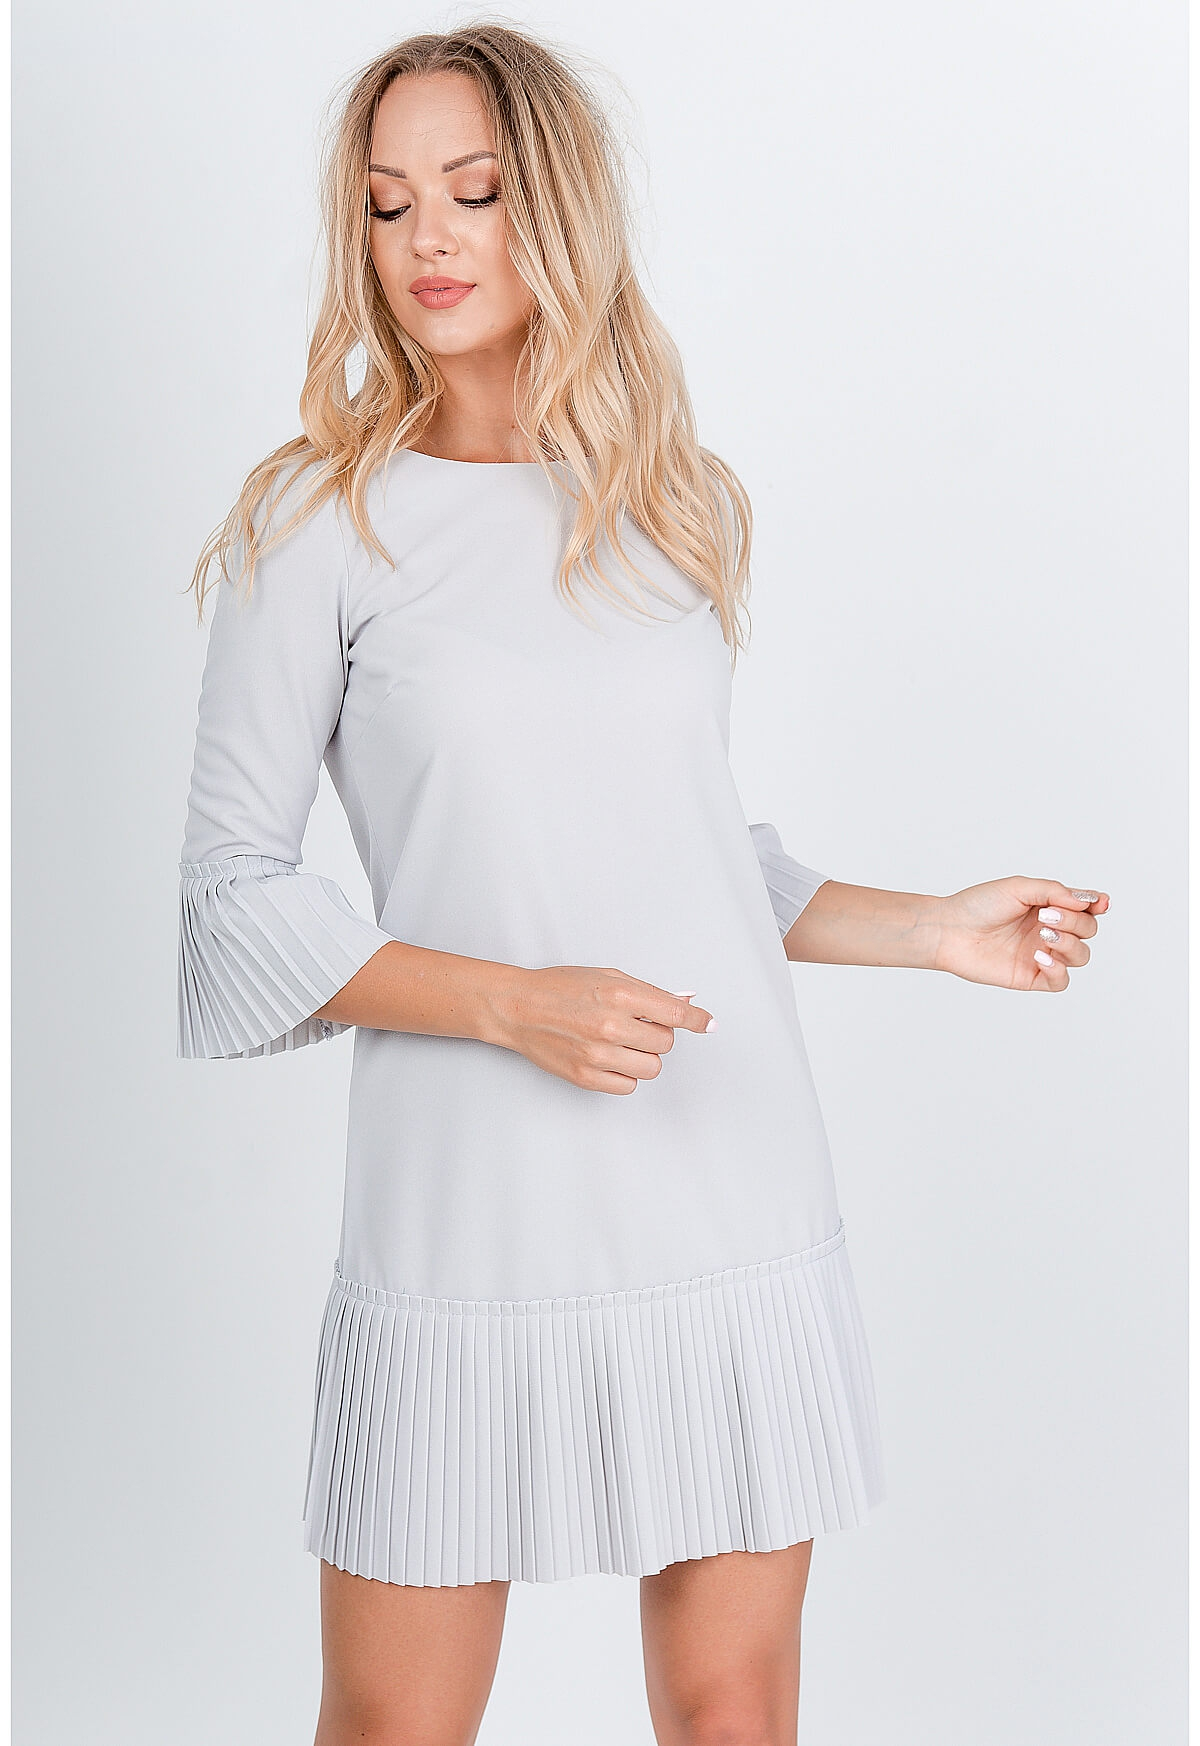 Krátke sivé šaty zdobené volánmi - S